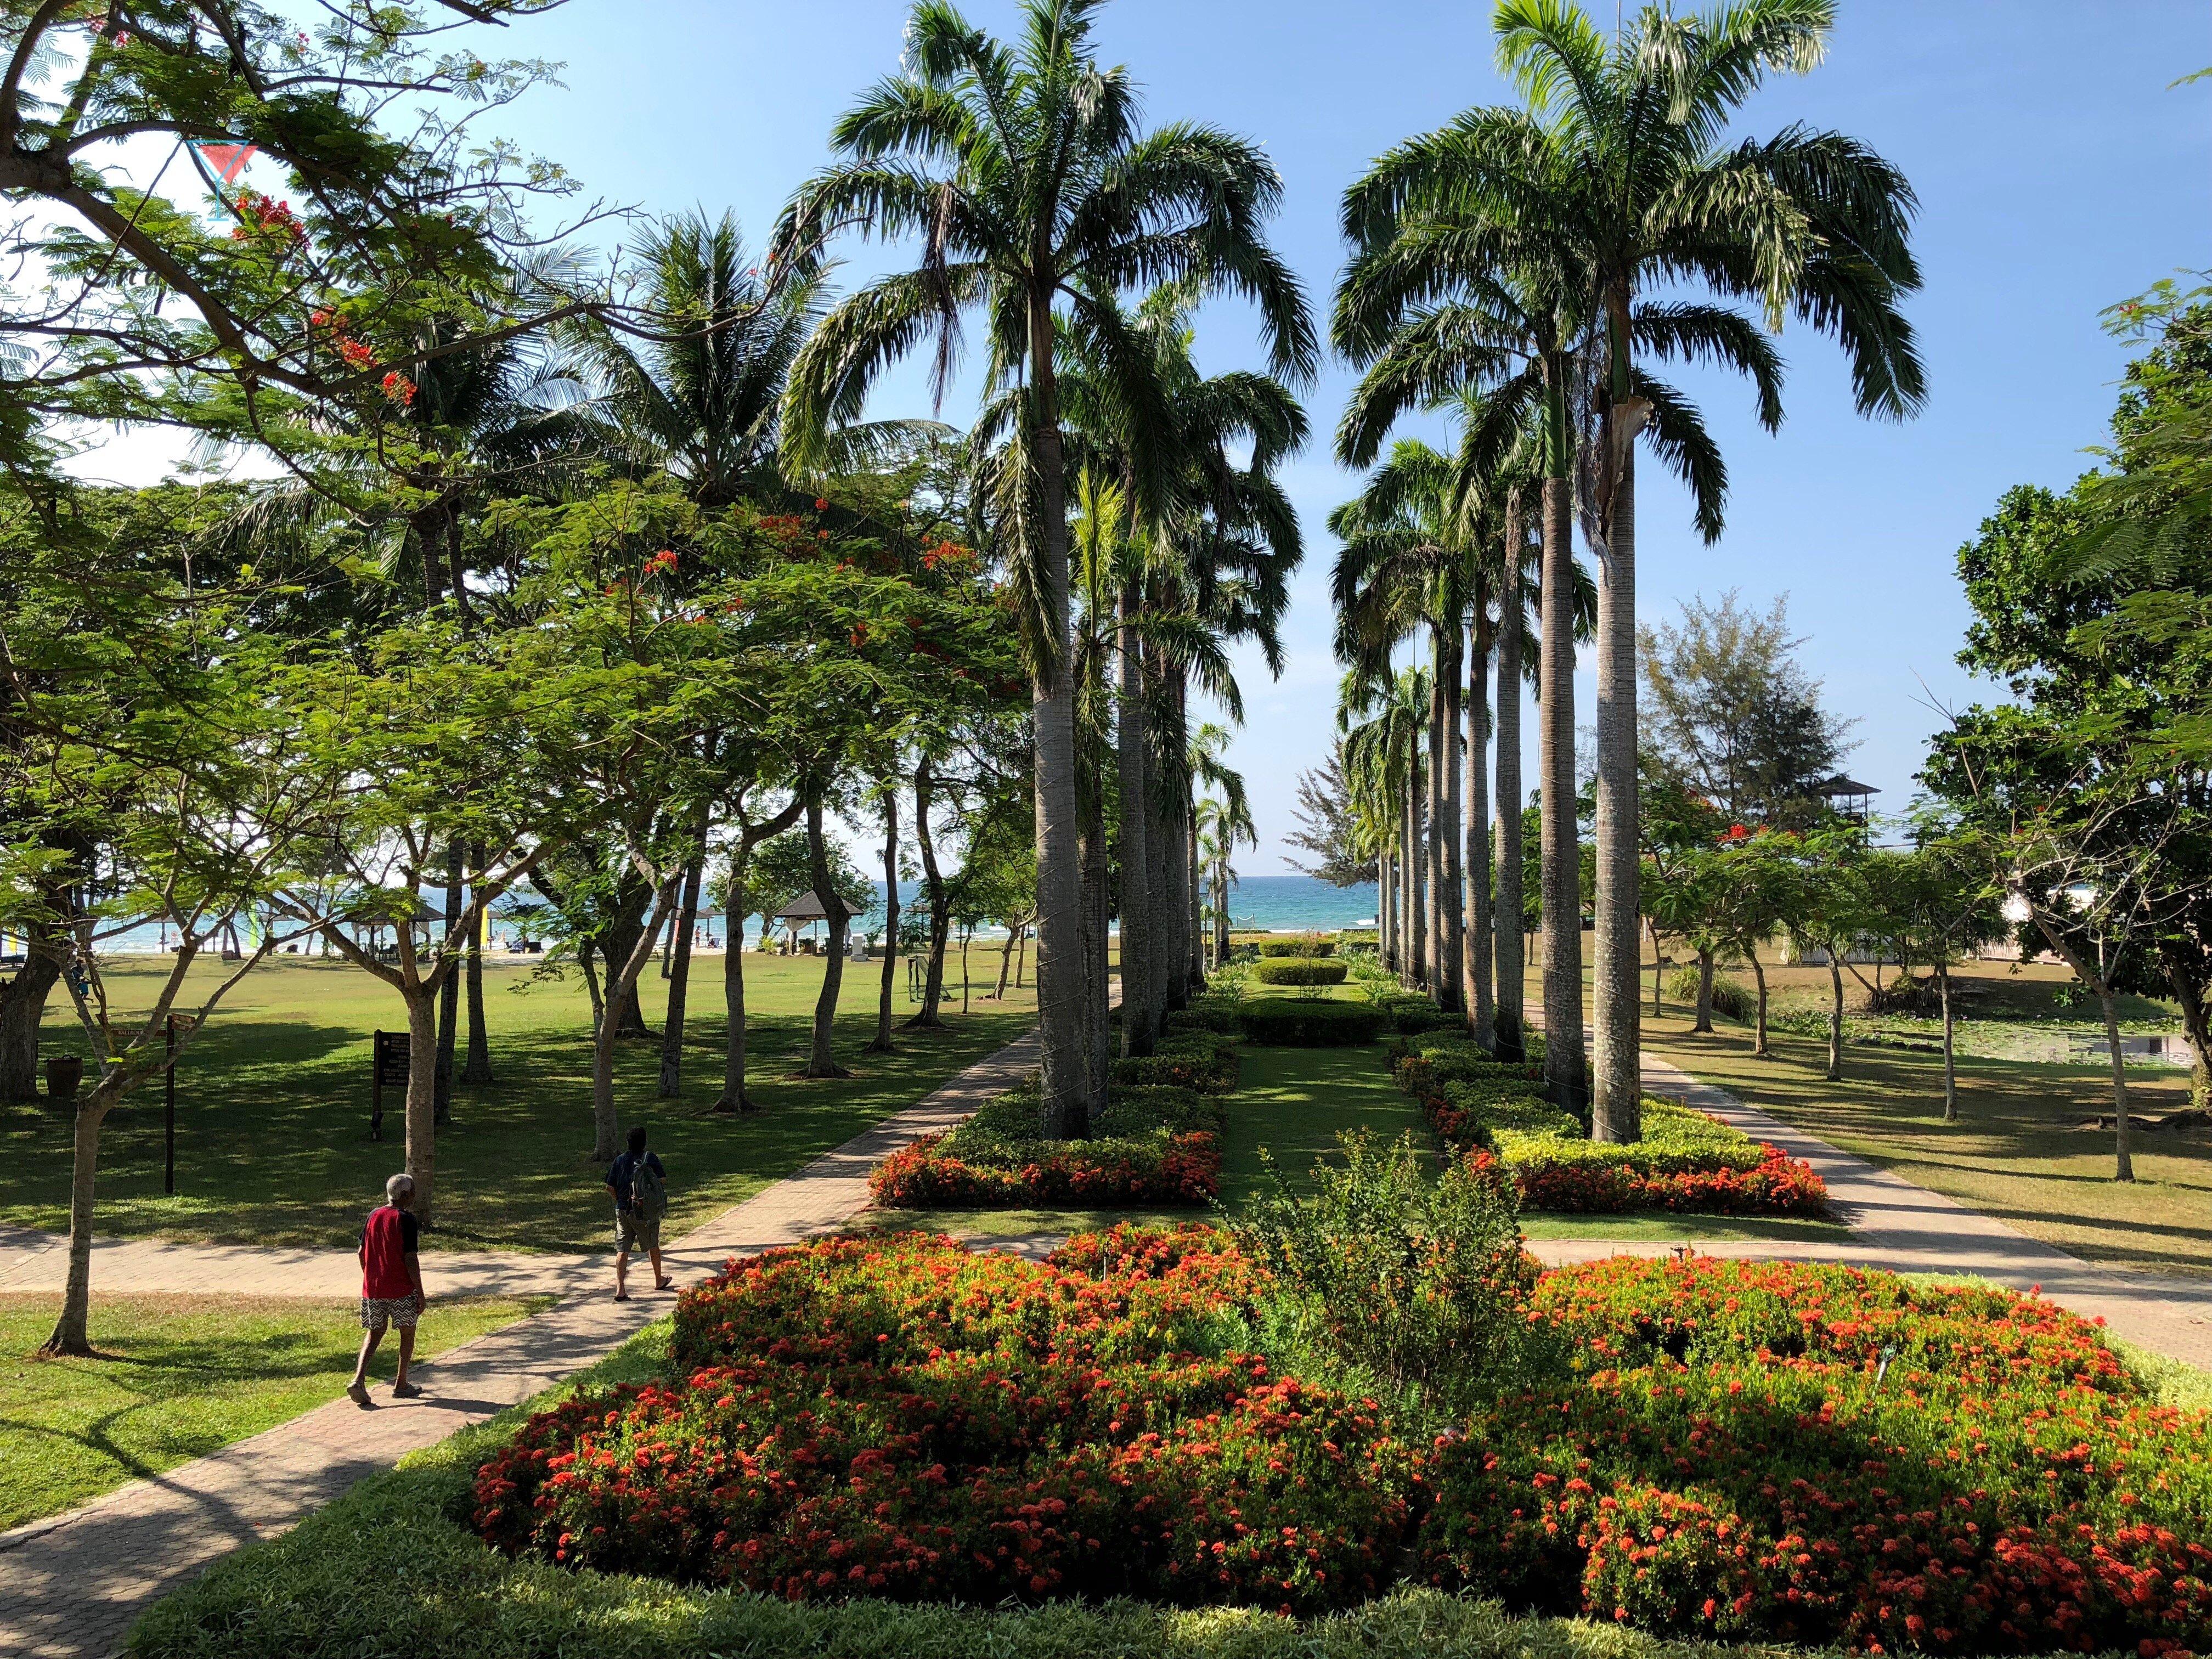 A Kota Kinabalu Vacation